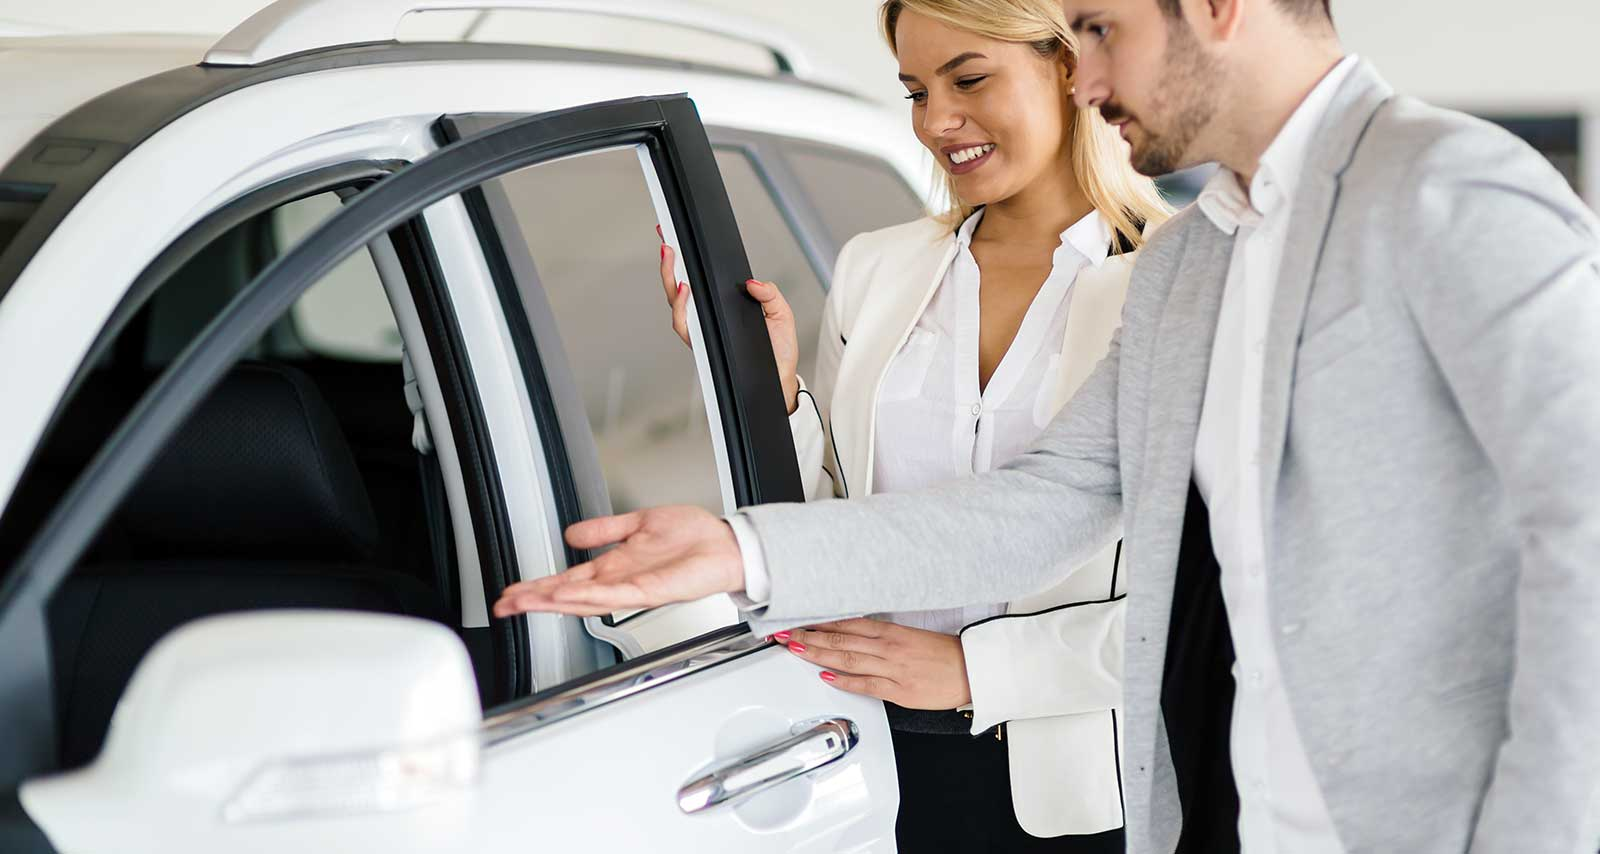 Mann und Frau übernehmen Auto-Abo Fahrzeug.